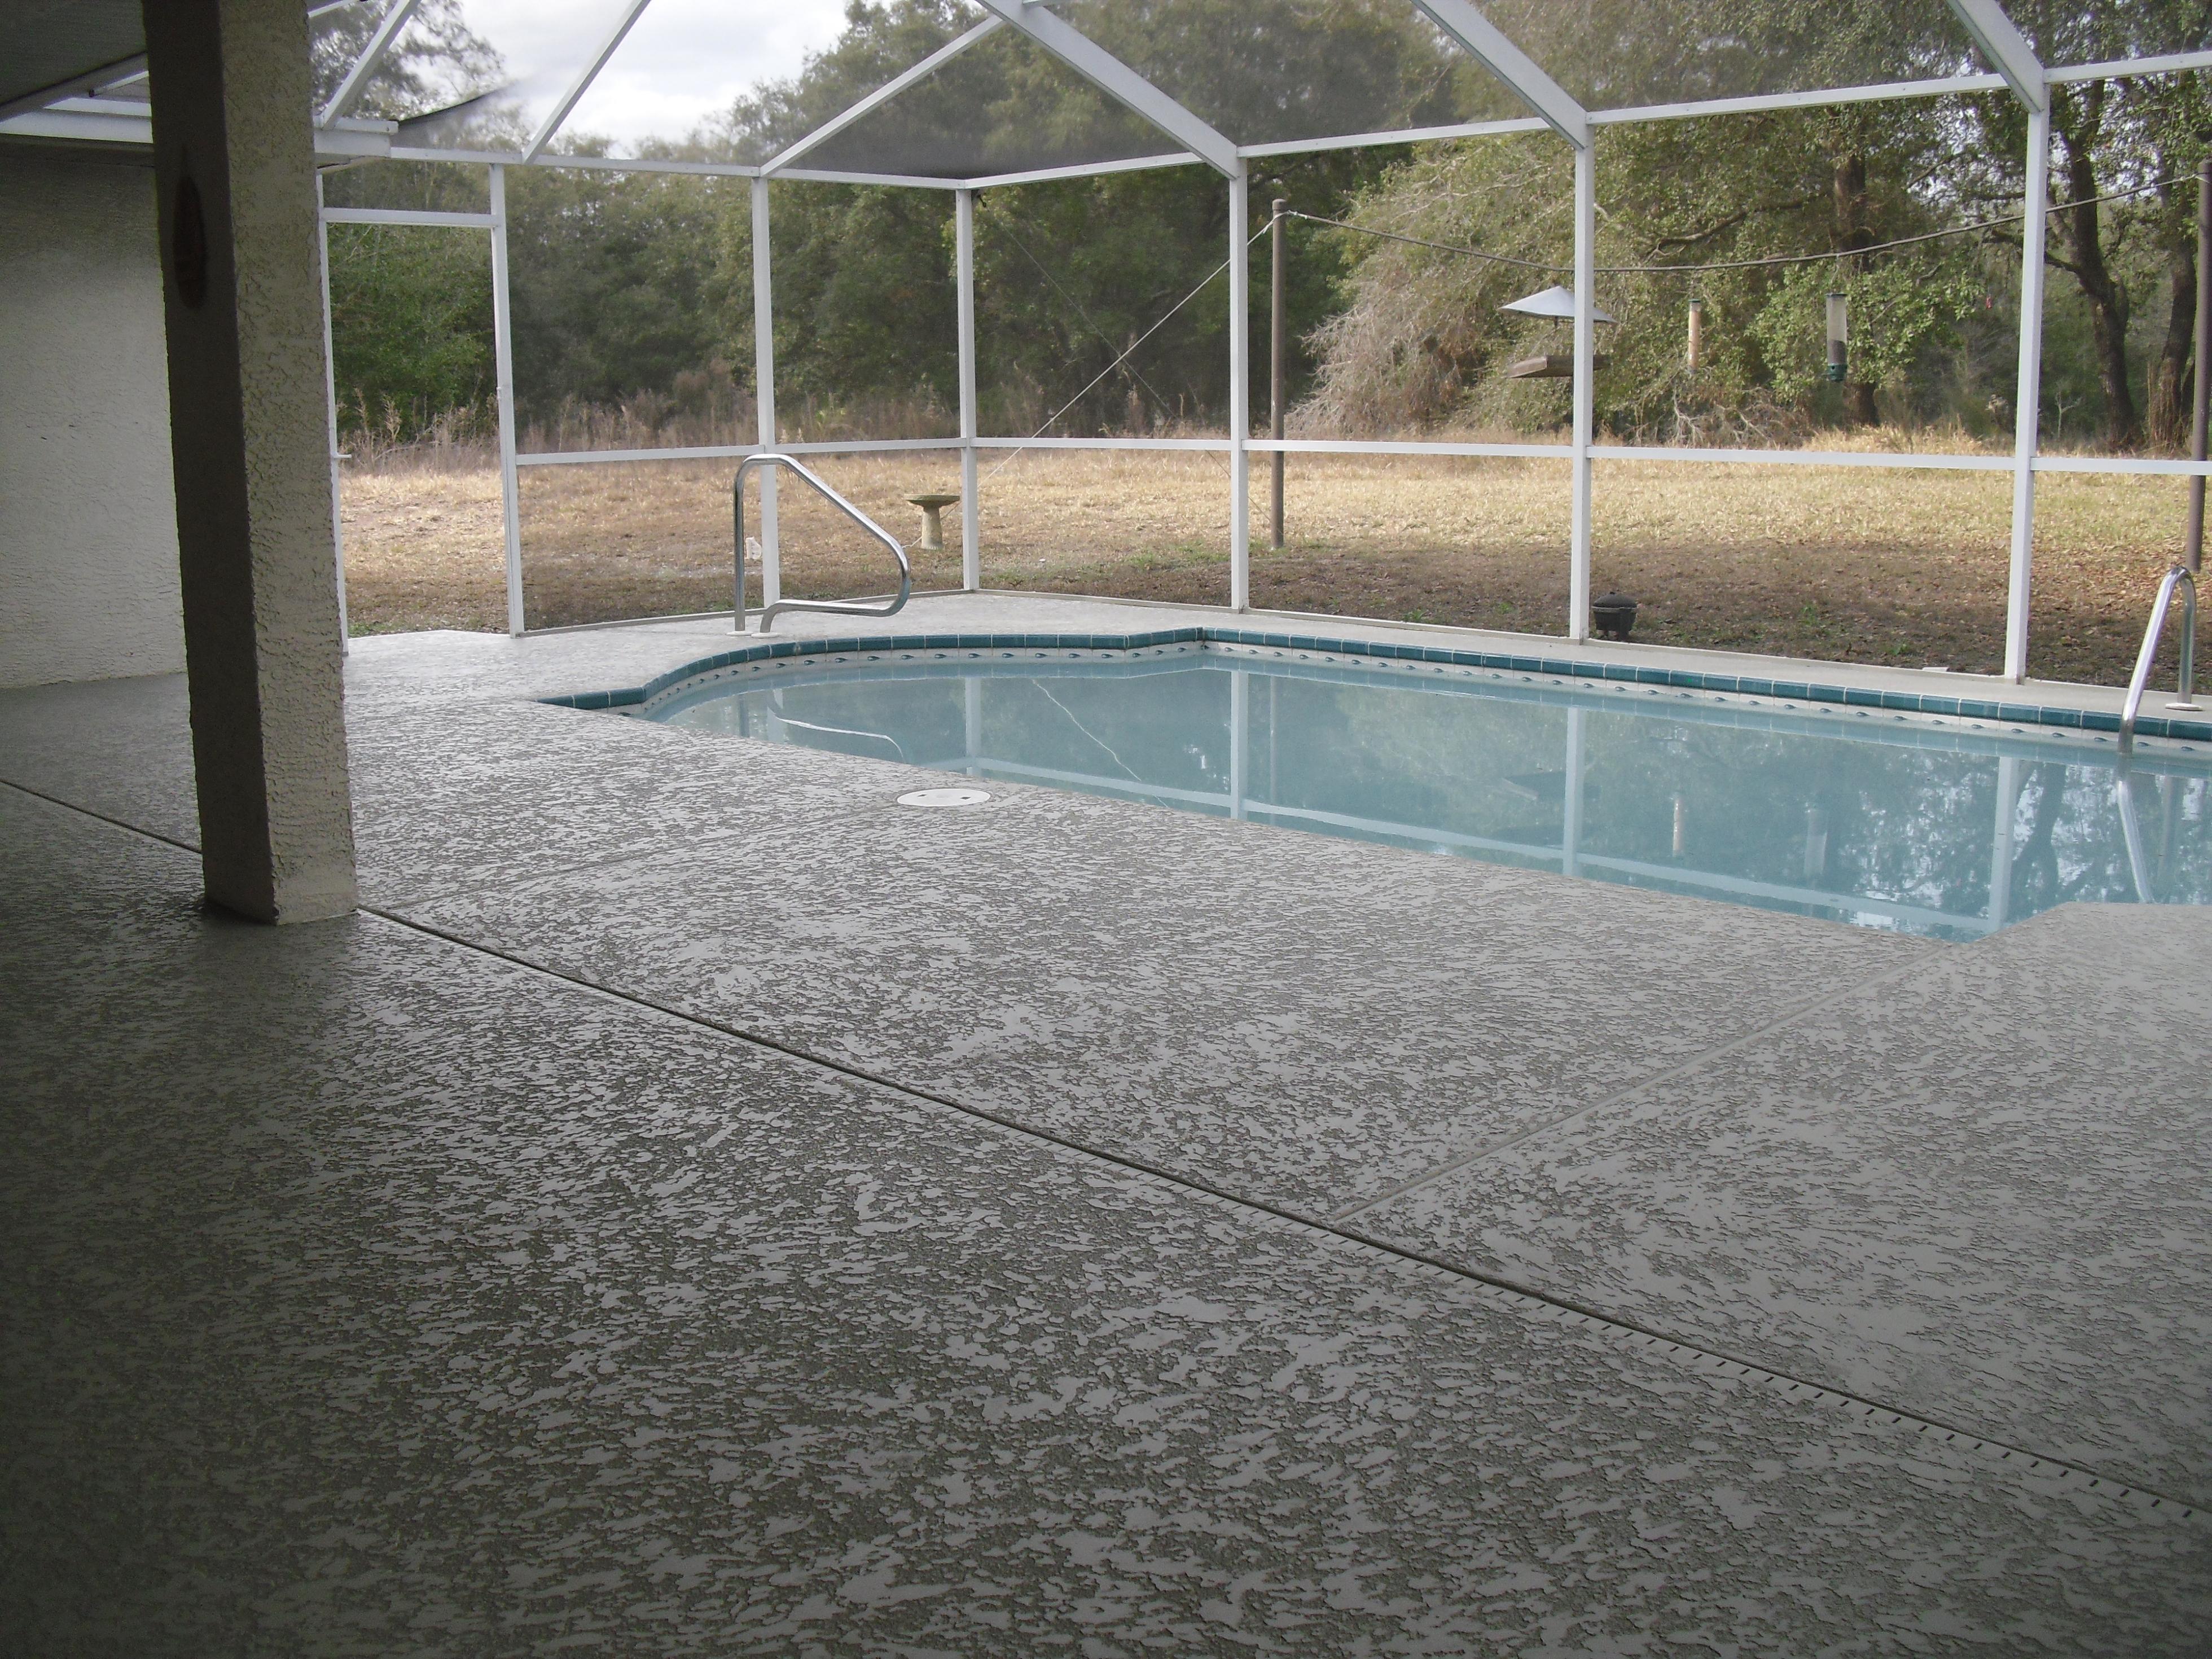 Outdoor Carpeting For Pool Decks Decks Ideas